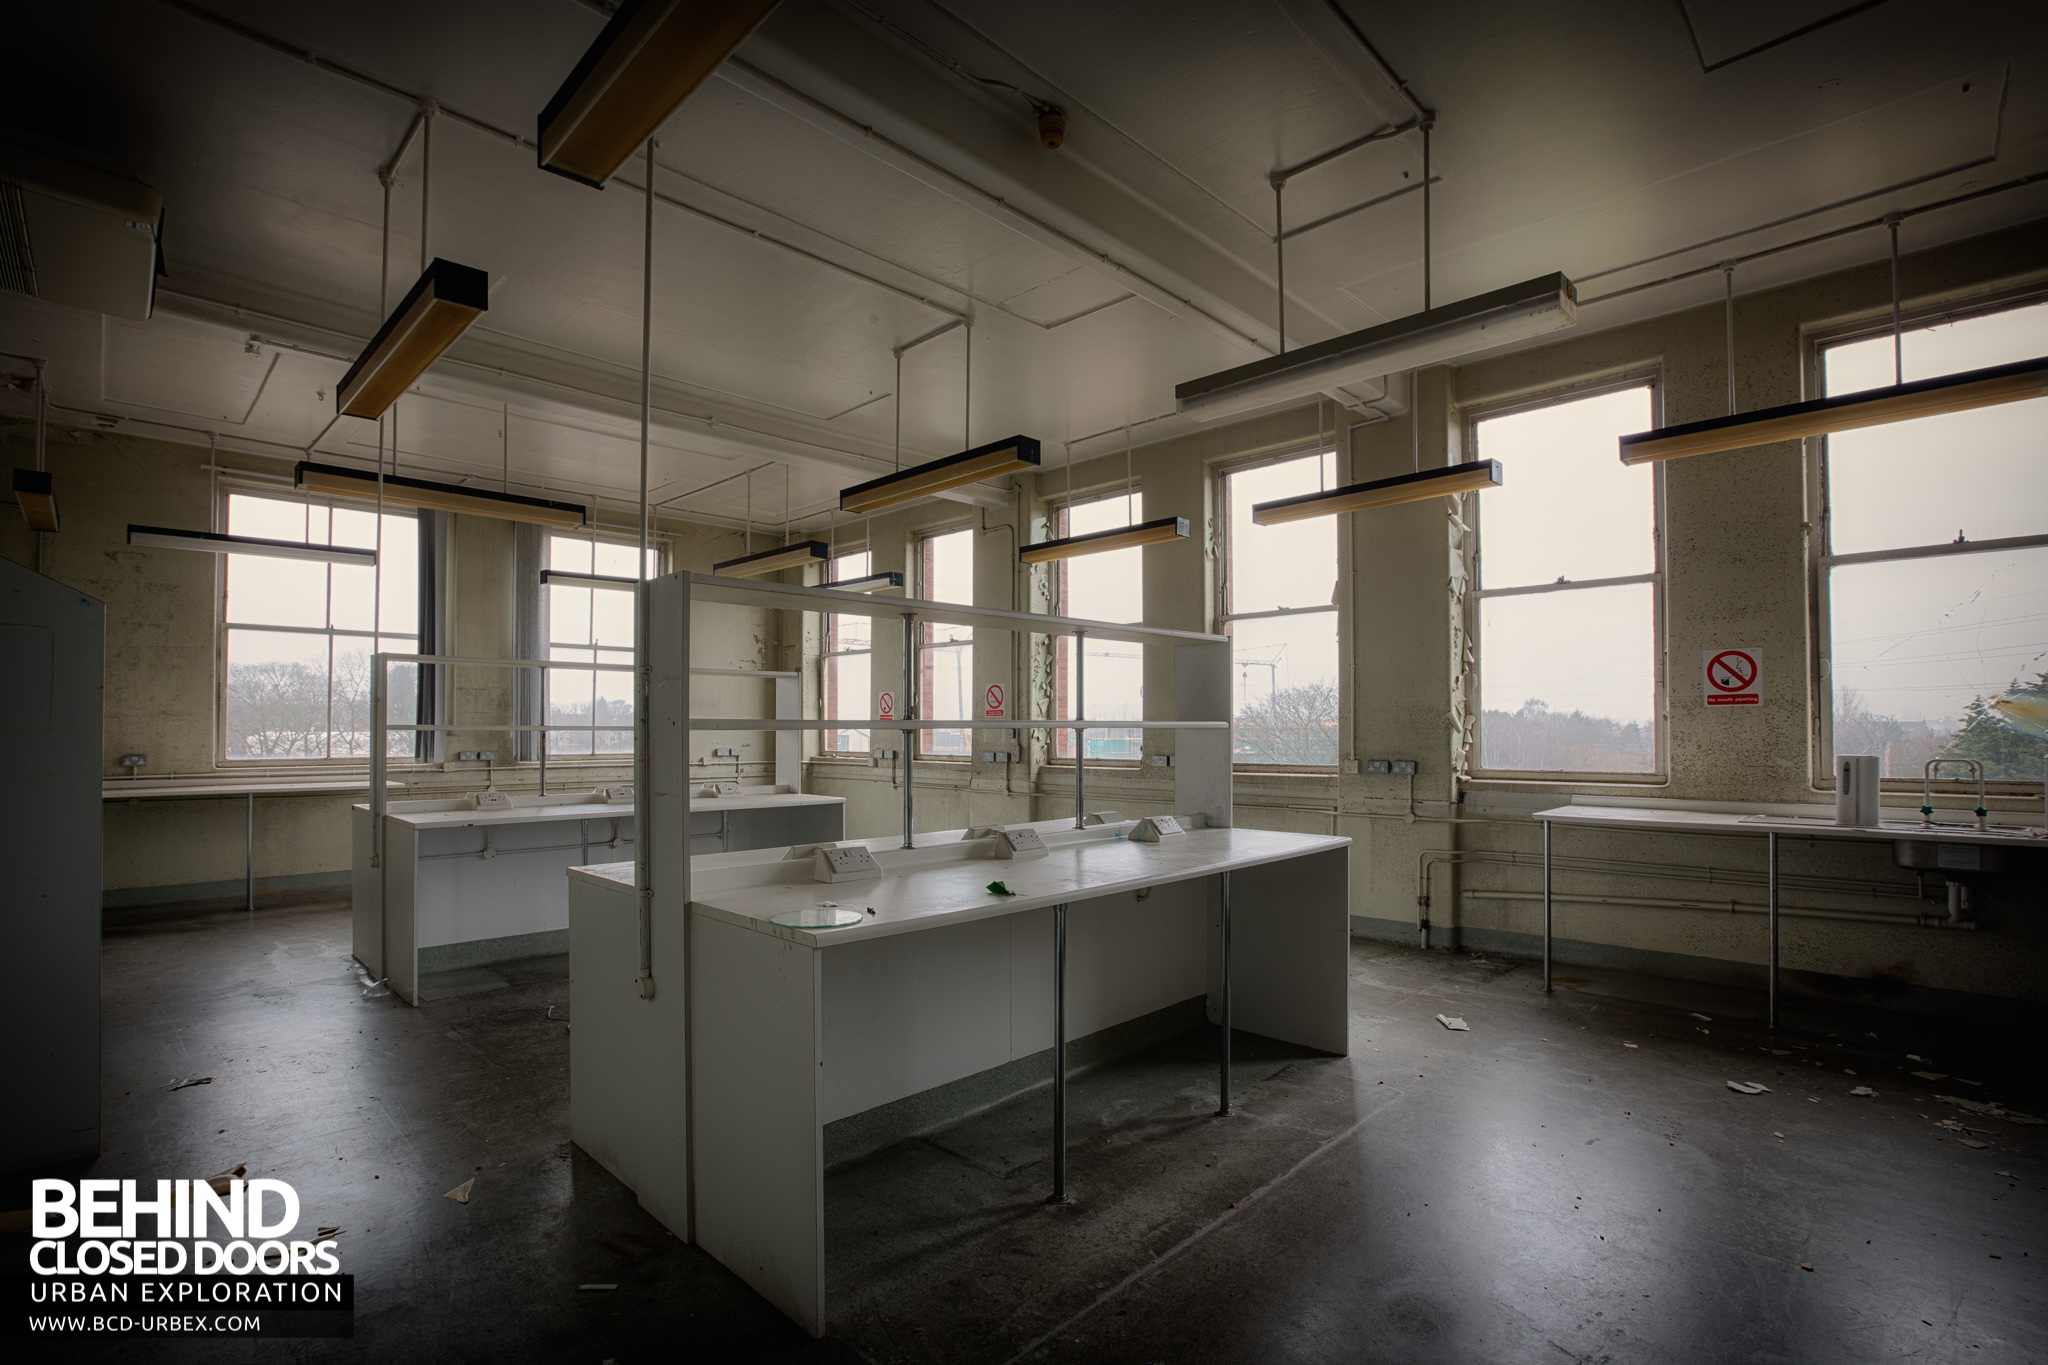 Selly Oak Hospital Abandoned Mortuary And Pathology Labs